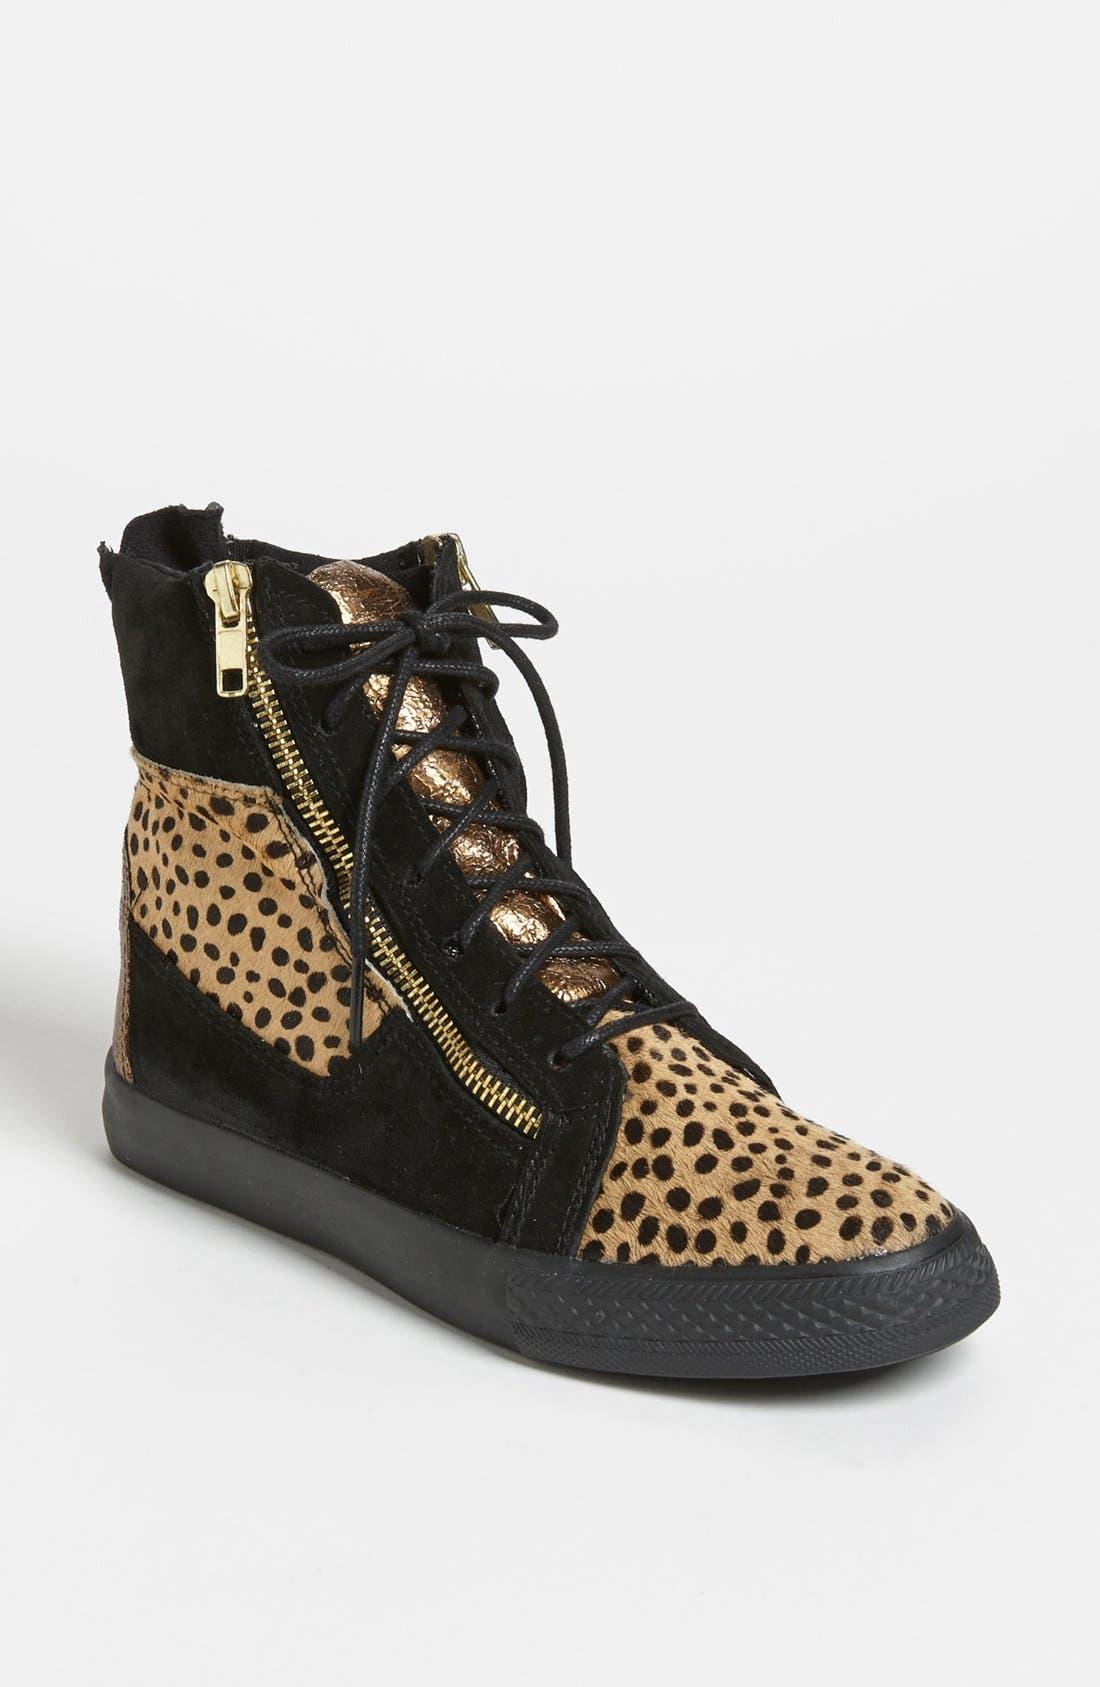 Alternate Image 1 Selected - Betsey Johnson 'Nathan' Sneaker